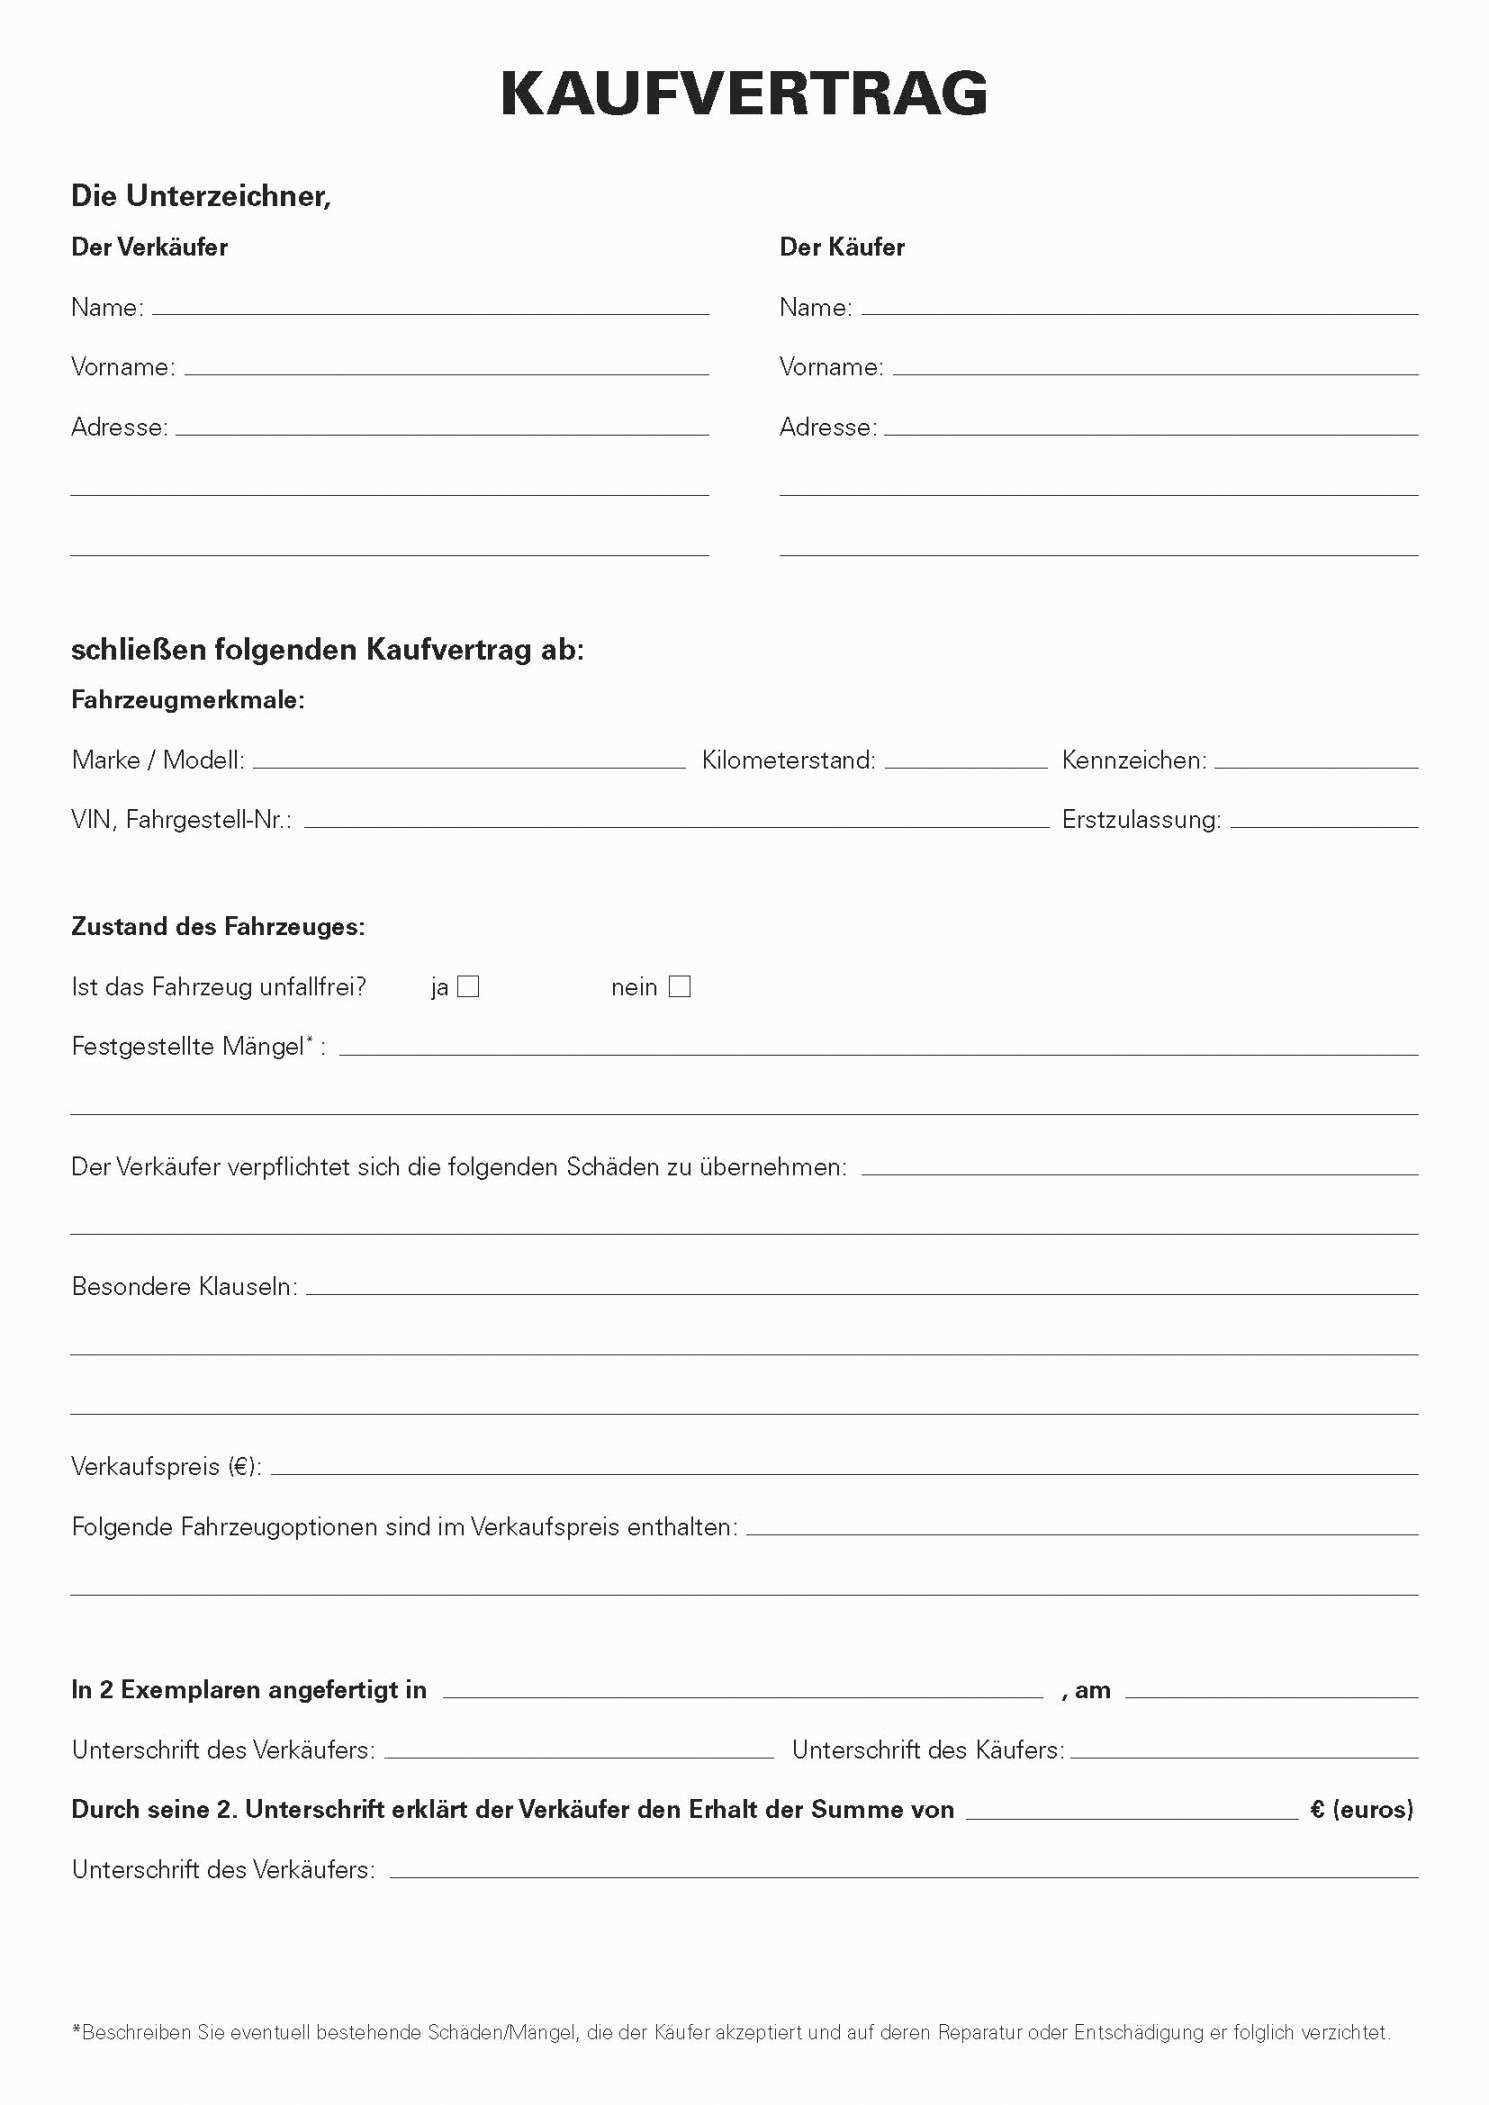 15 Muster Kaufvertrag Kfz Lehavreactif Harmonischerstaunlich Kfz Kaufvertrag Vorlage Kaufvertrag Vorlage Wolle Kaufen Kaufvertrag